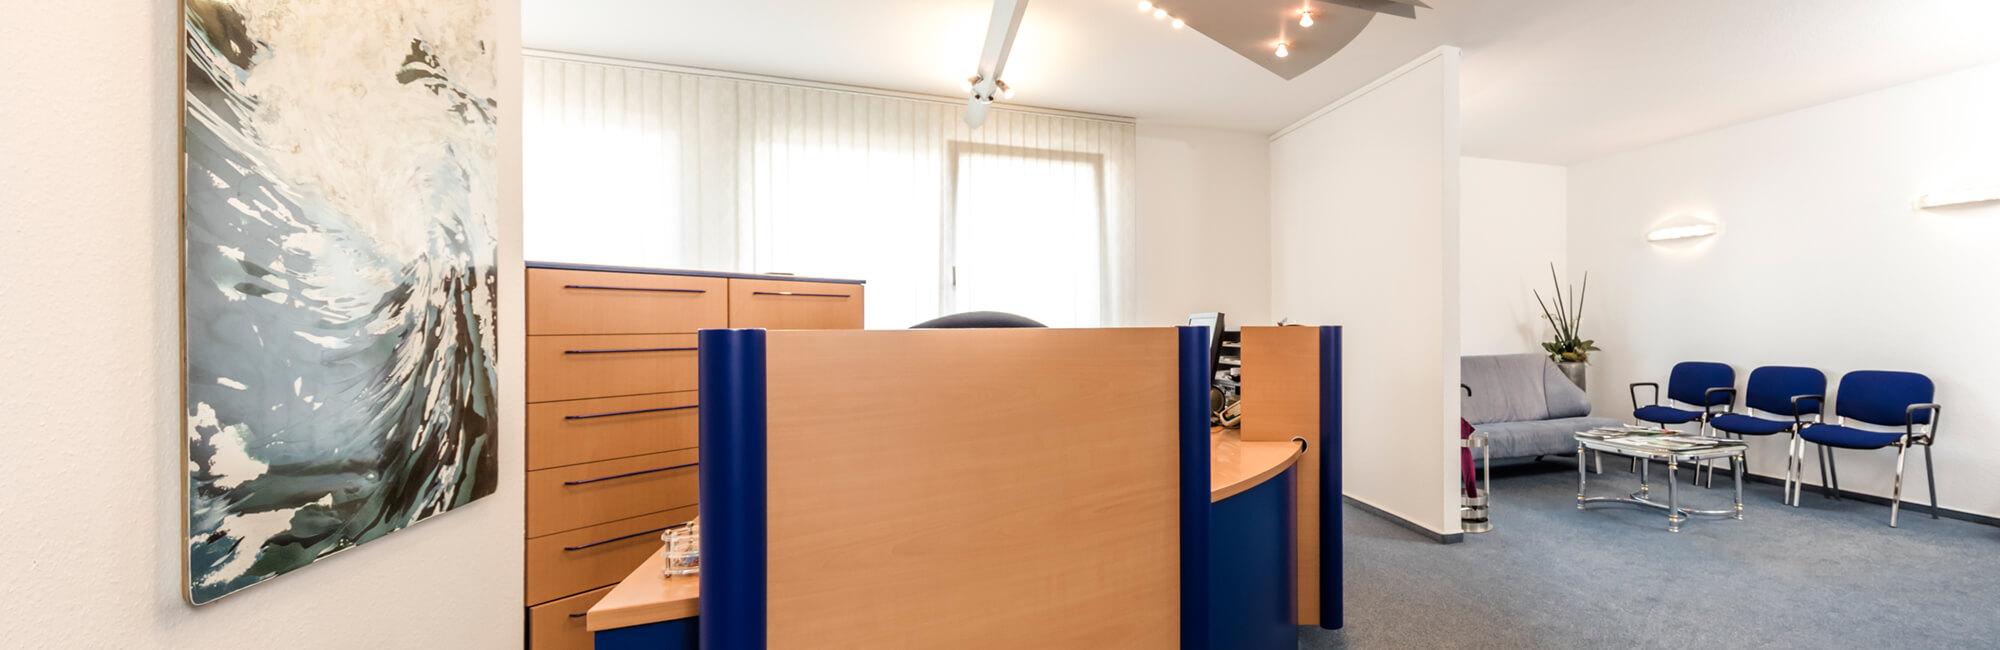 Zahnarzt Köln Rondorf - Tiddens - Empfangsbereich der Praxis